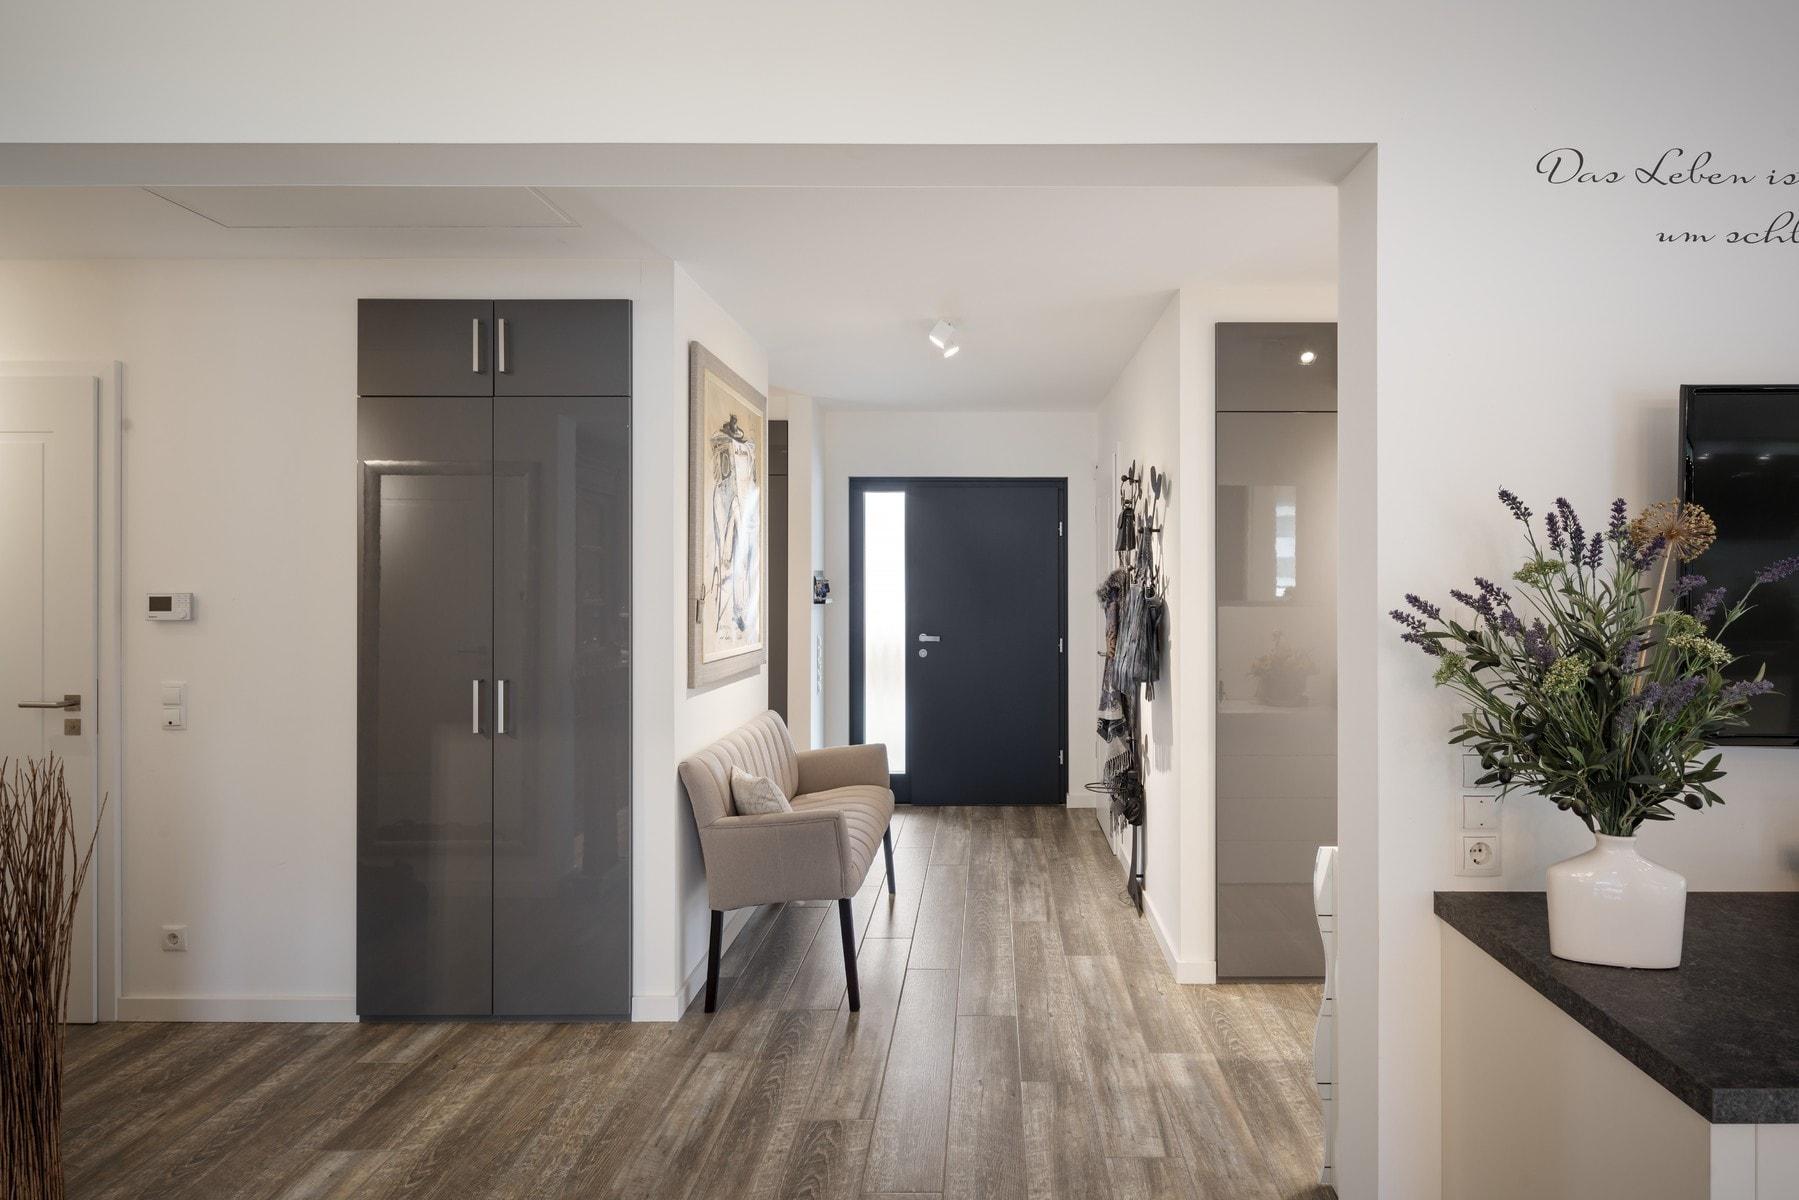 Eingangsbereich mit Garderobe - Inneneinrichtung Haus Design Ideen innen - Fertighaus Bungalow WeberHaus - HausbauDirekt.de